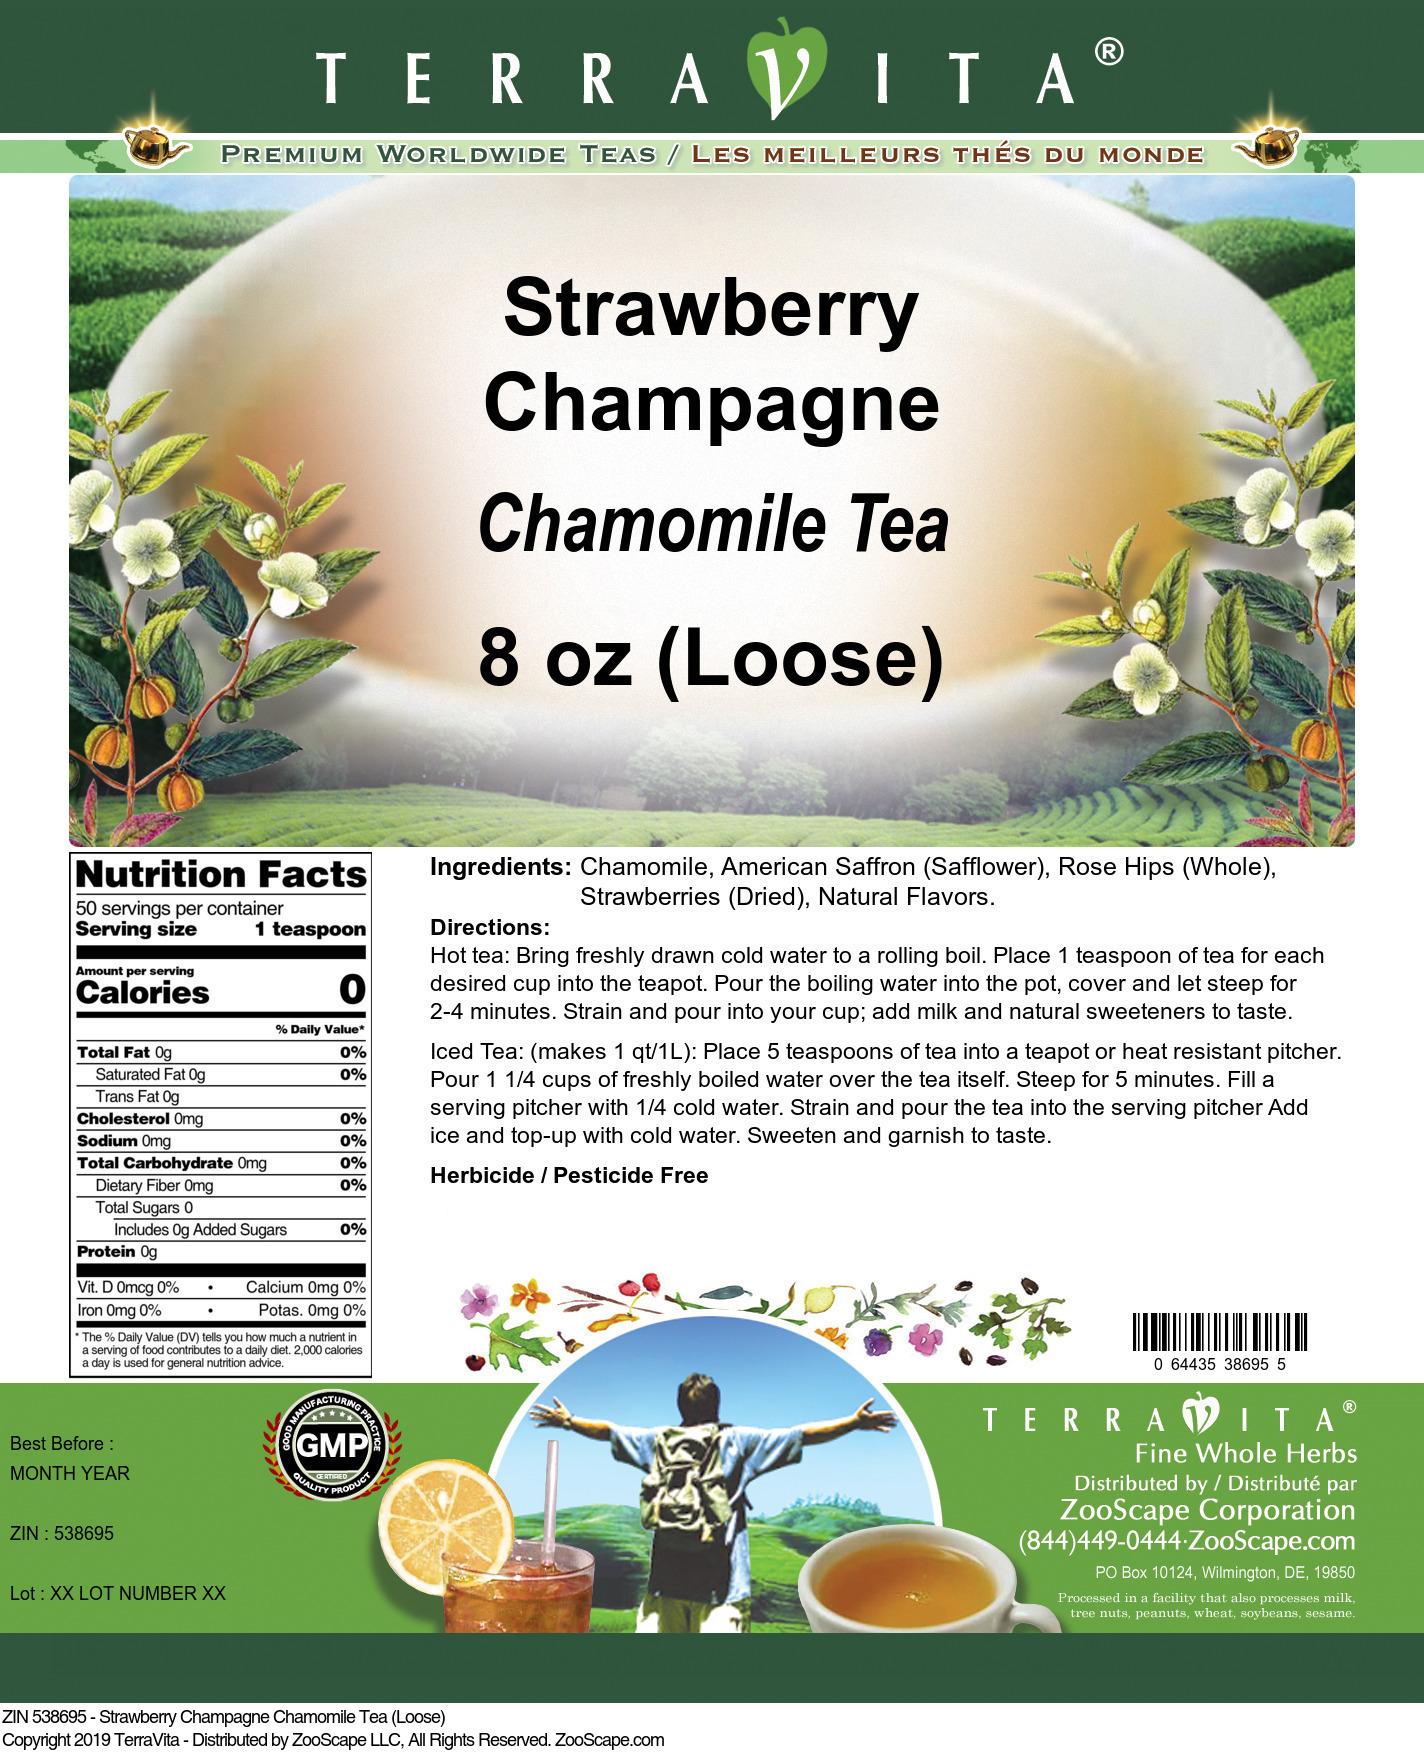 Strawberry Champagne Chamomile Tea (Loose)